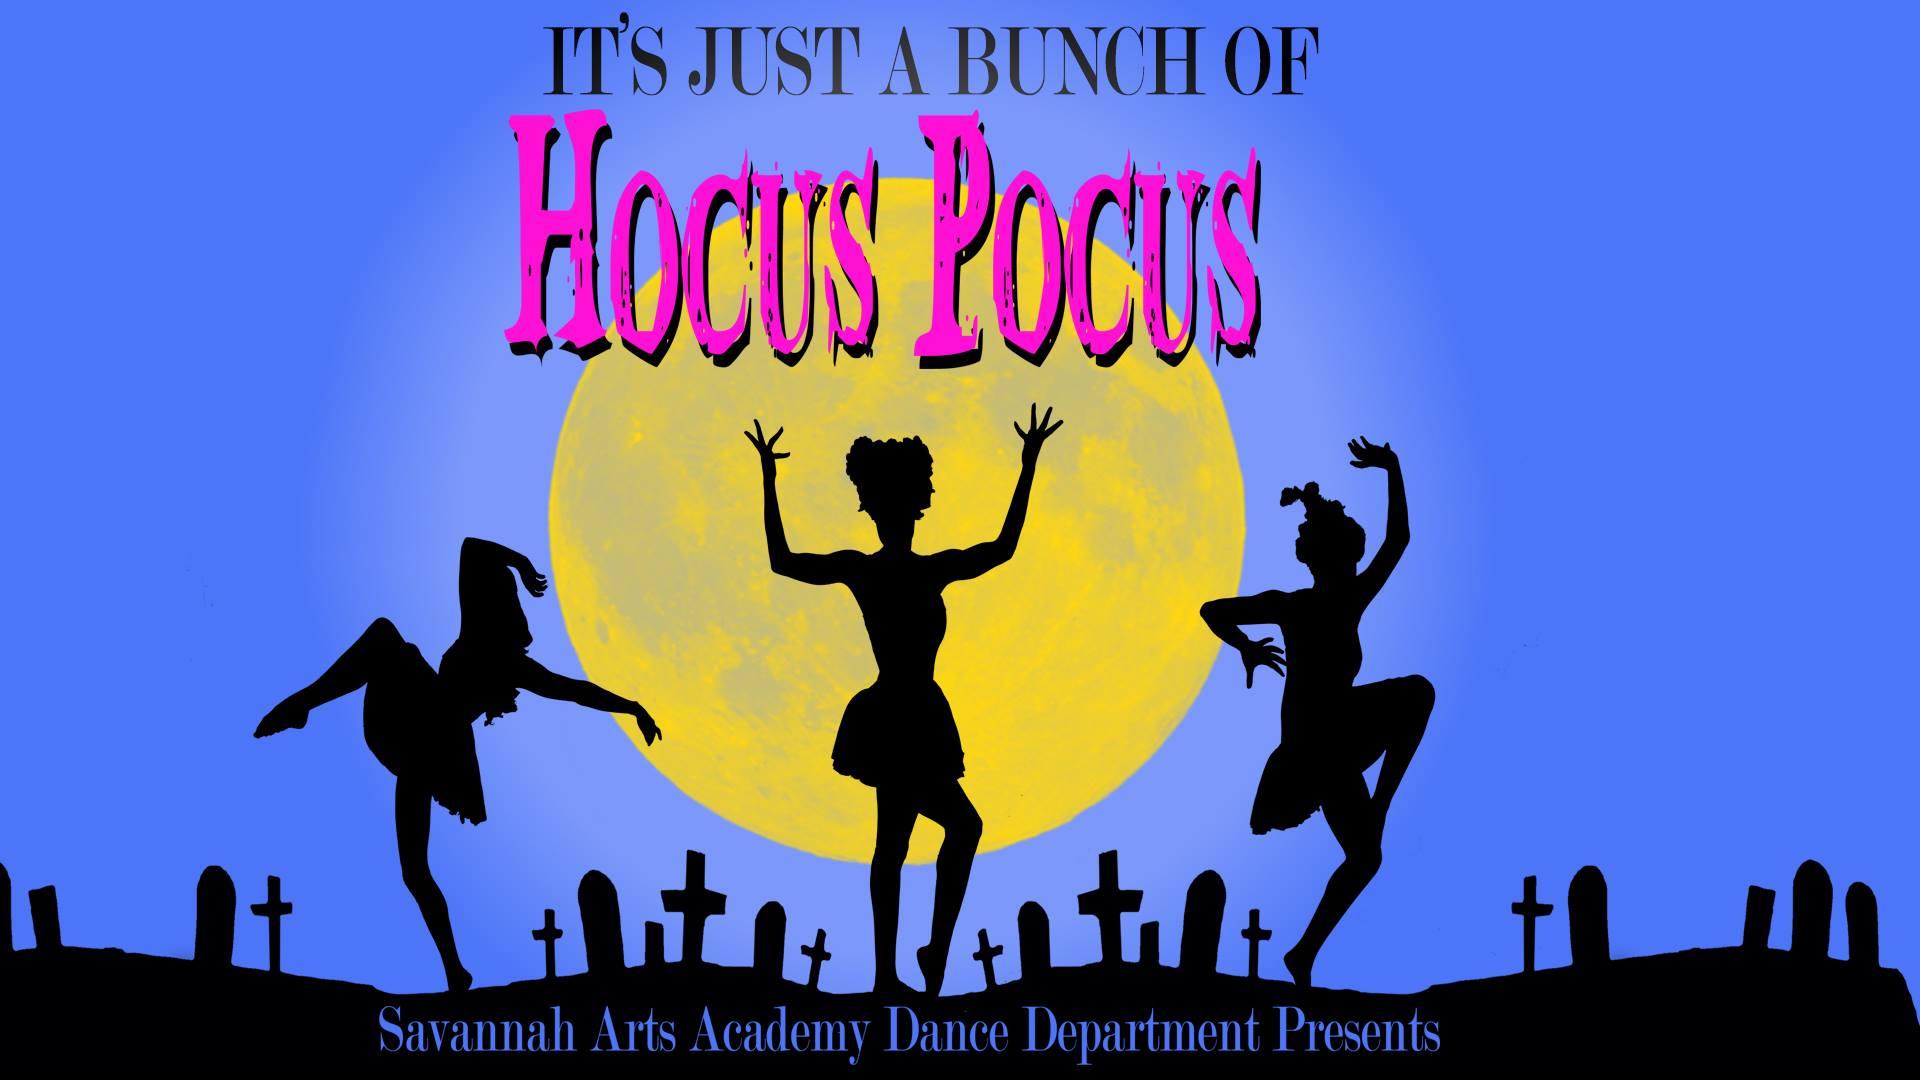 Hocus Pocus Savannah Arts Academy 2018